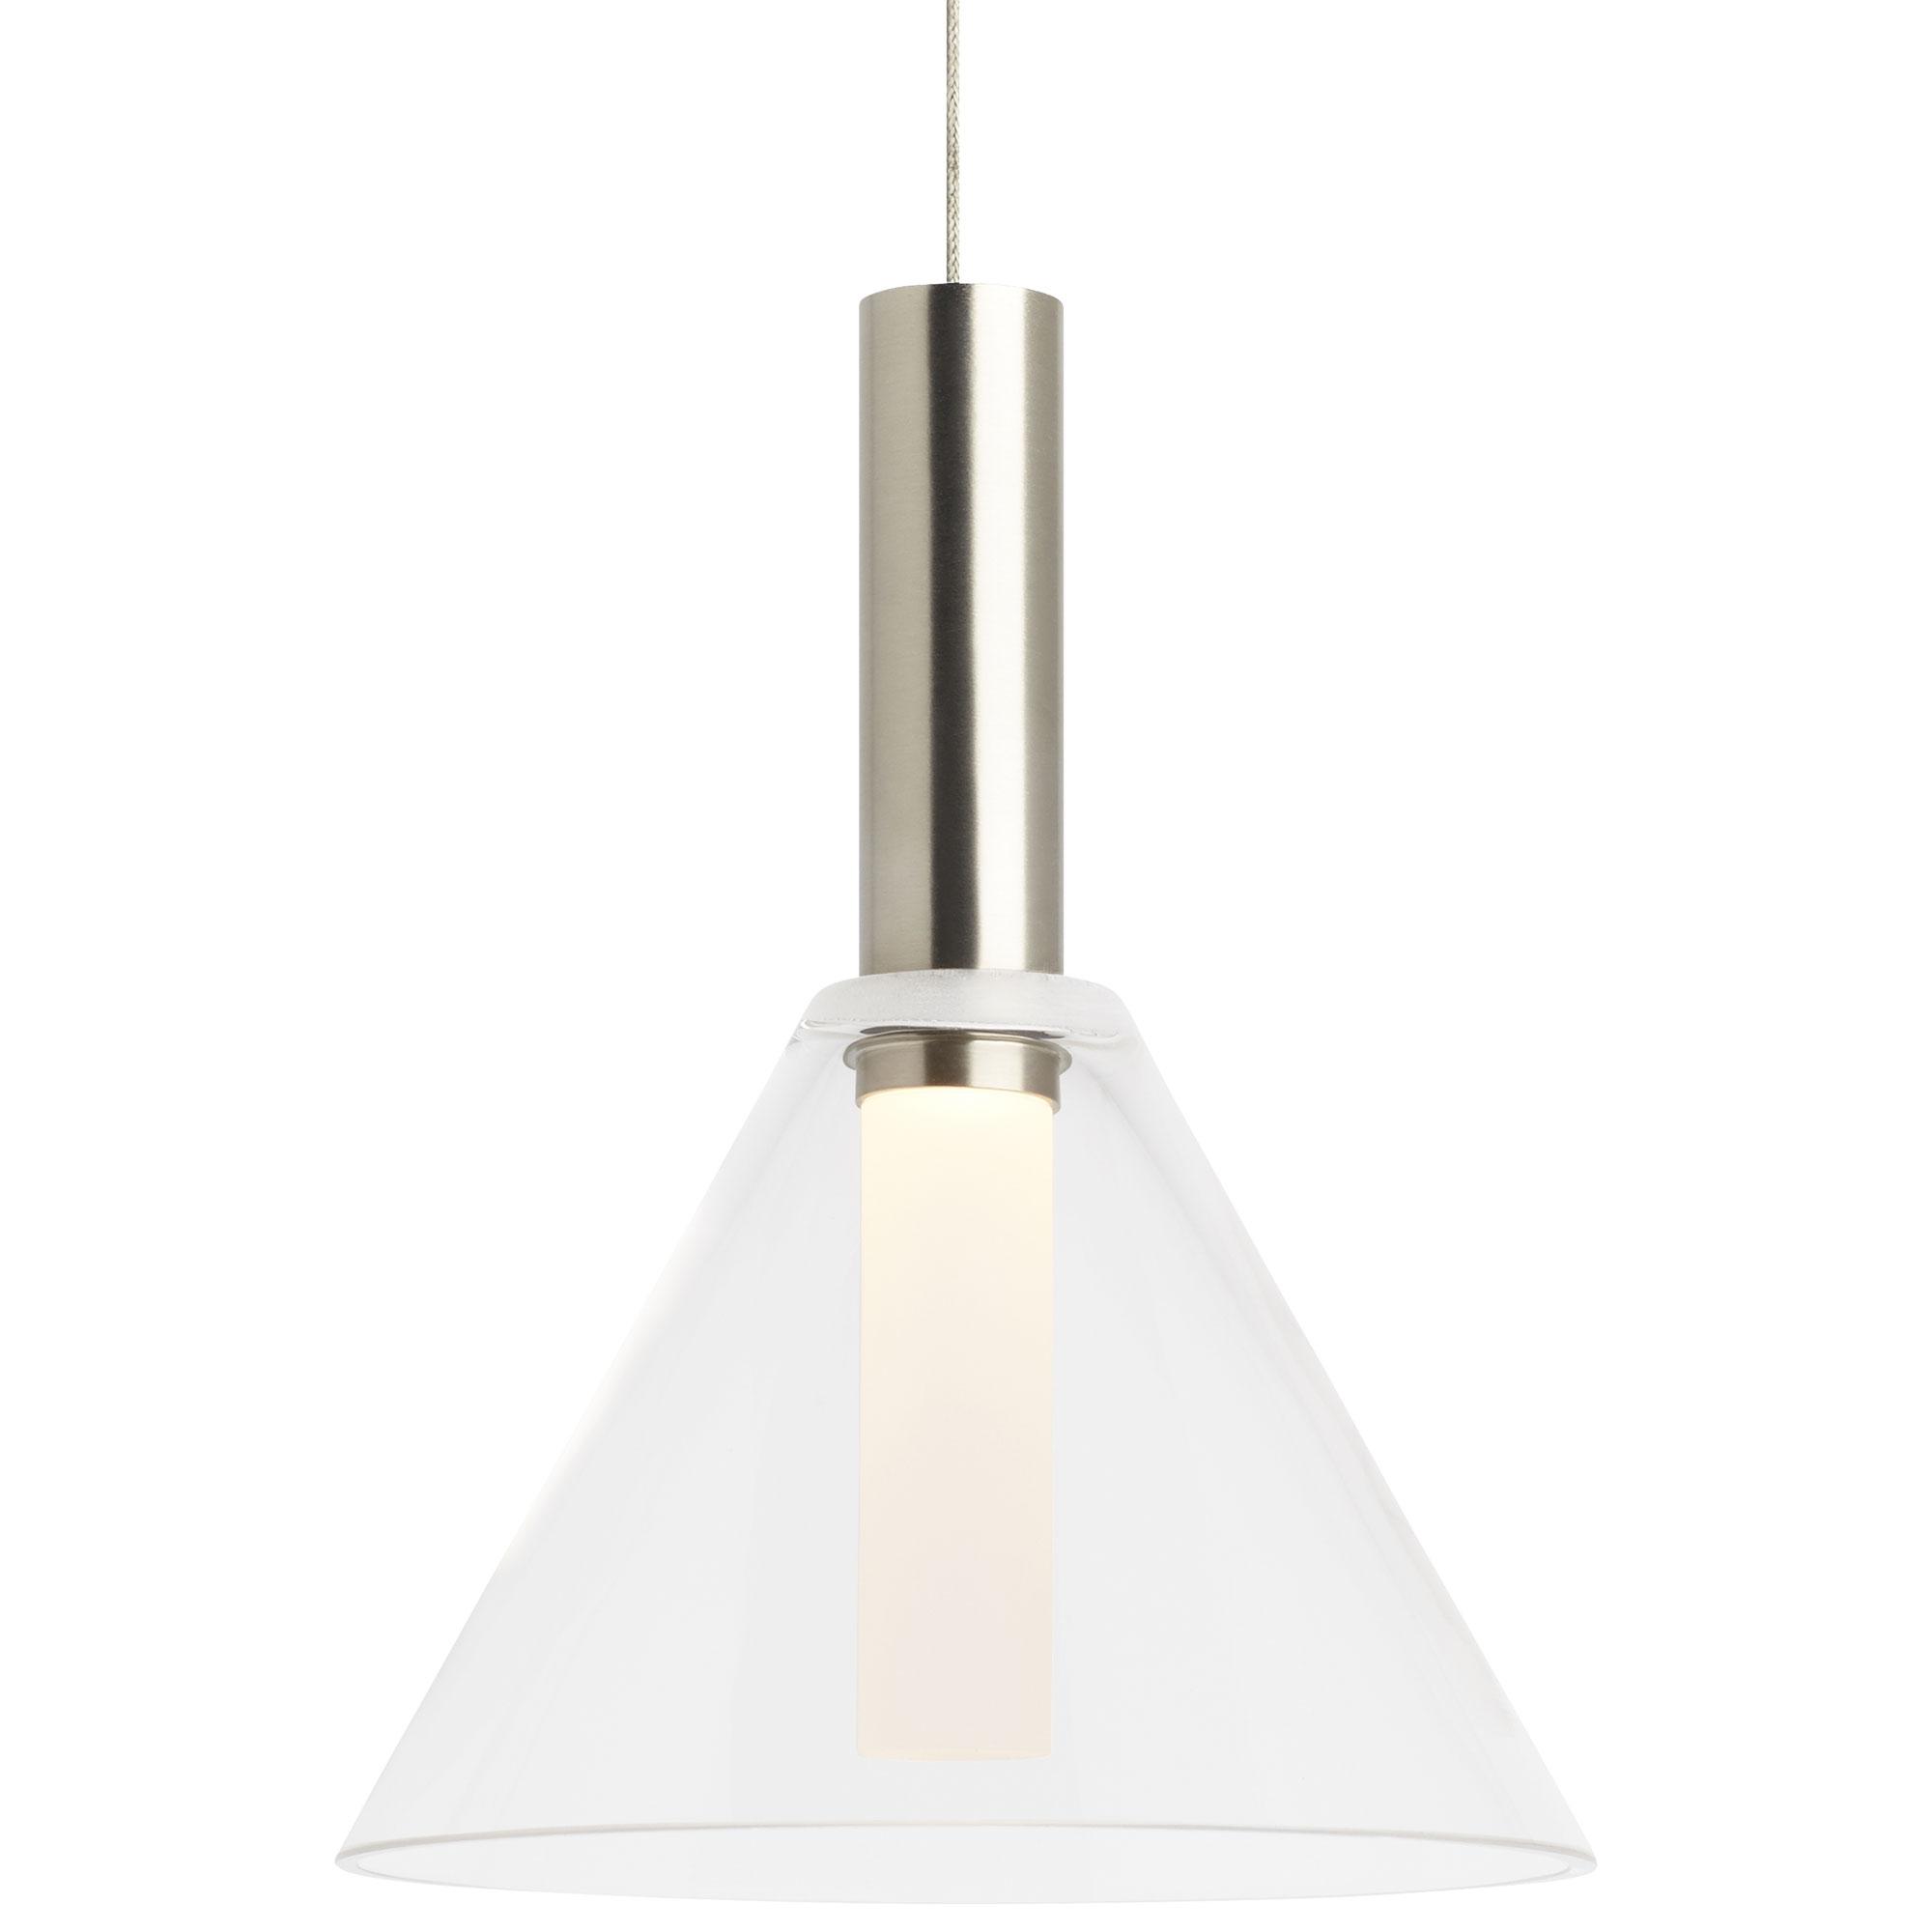 mezz monorail pendant by tech lighting 700momezcs led930